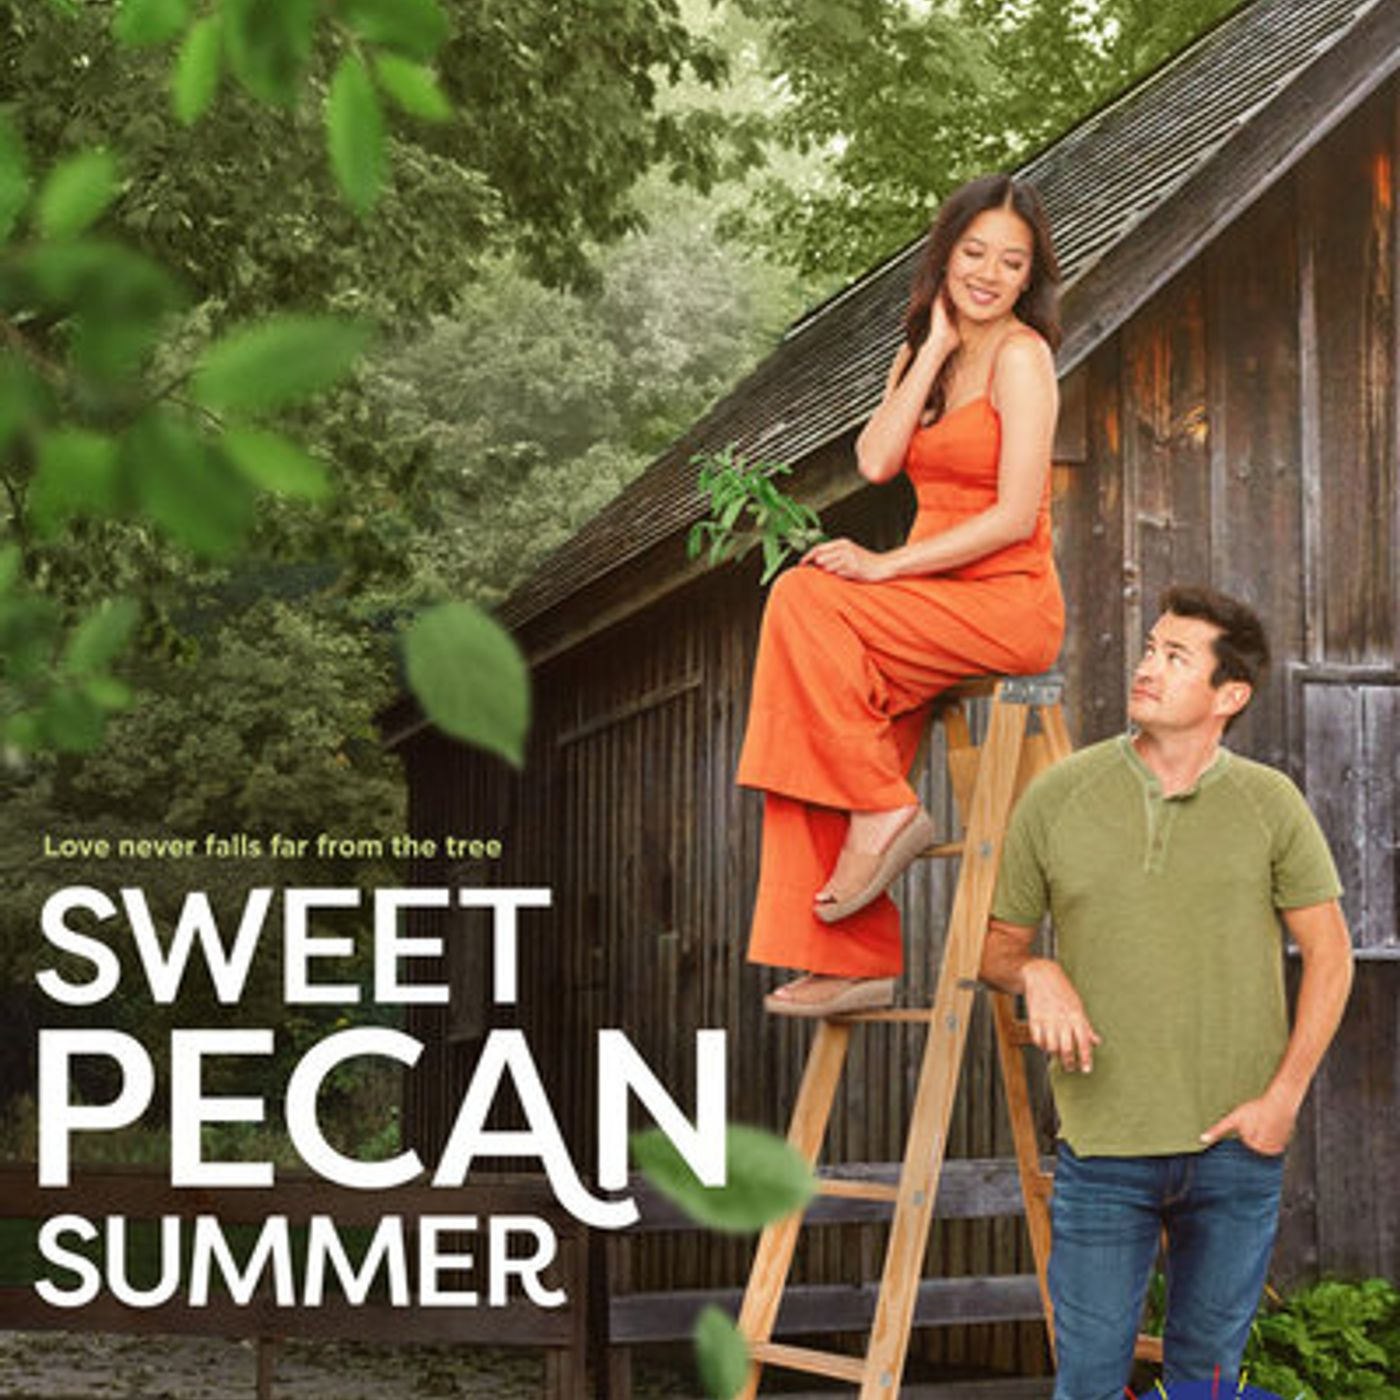 Sweet Pecan Summer (Hallmark Channel - 2021)